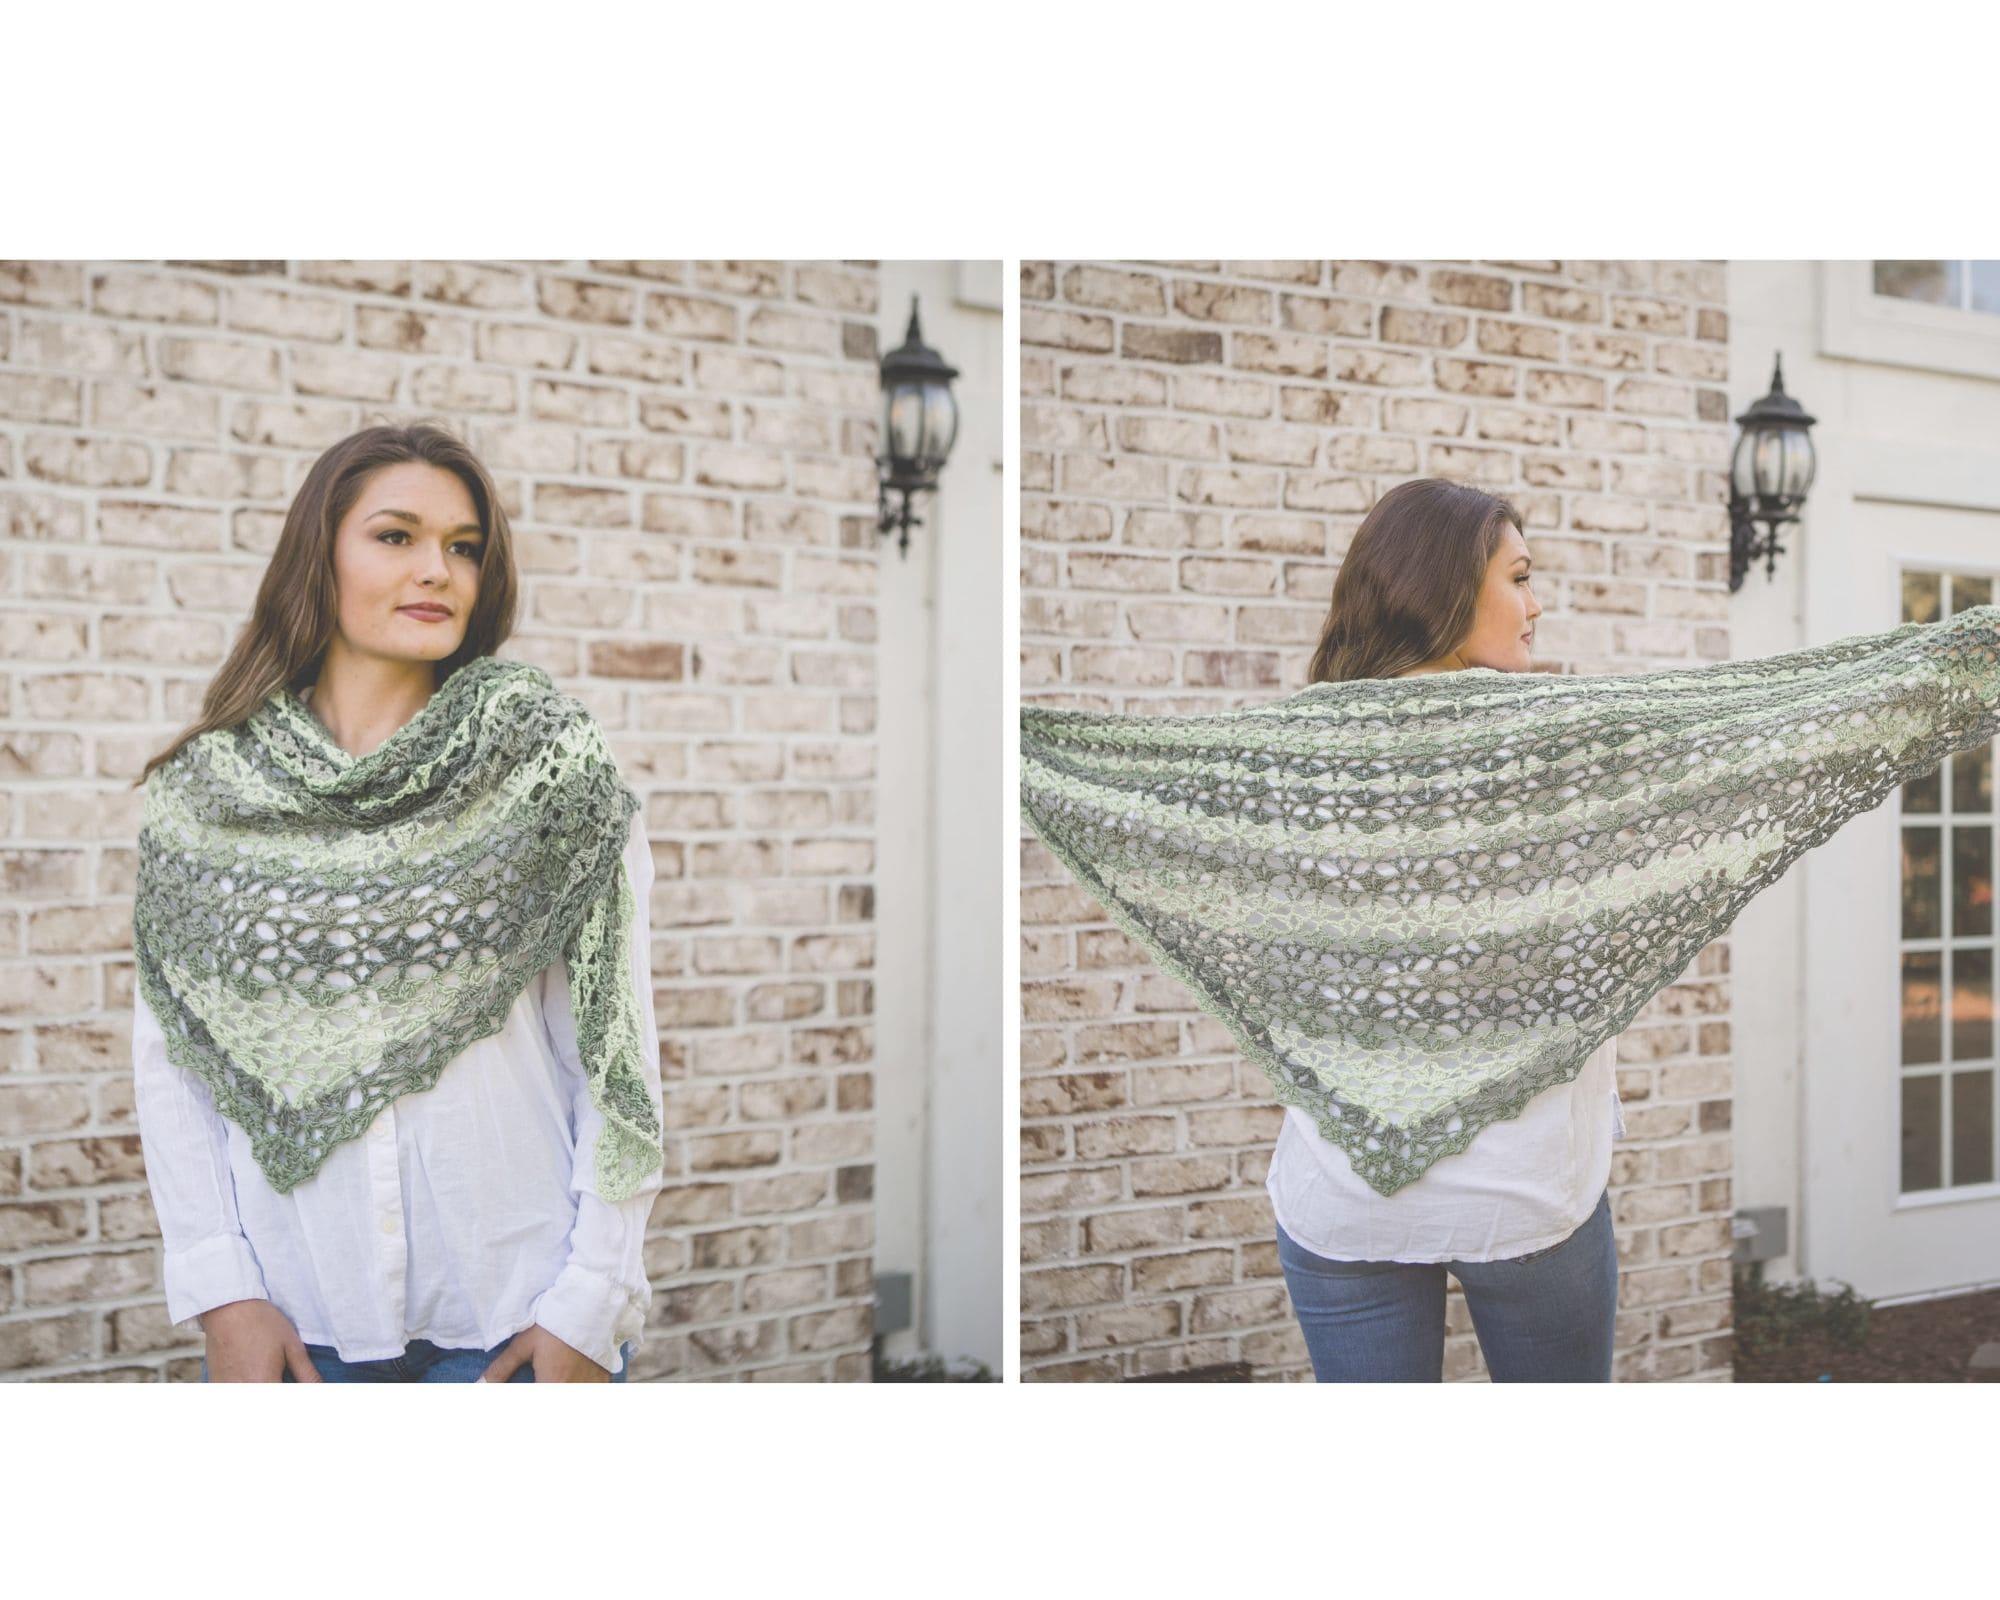 Chroma Shawl by Creation 8 Crochet